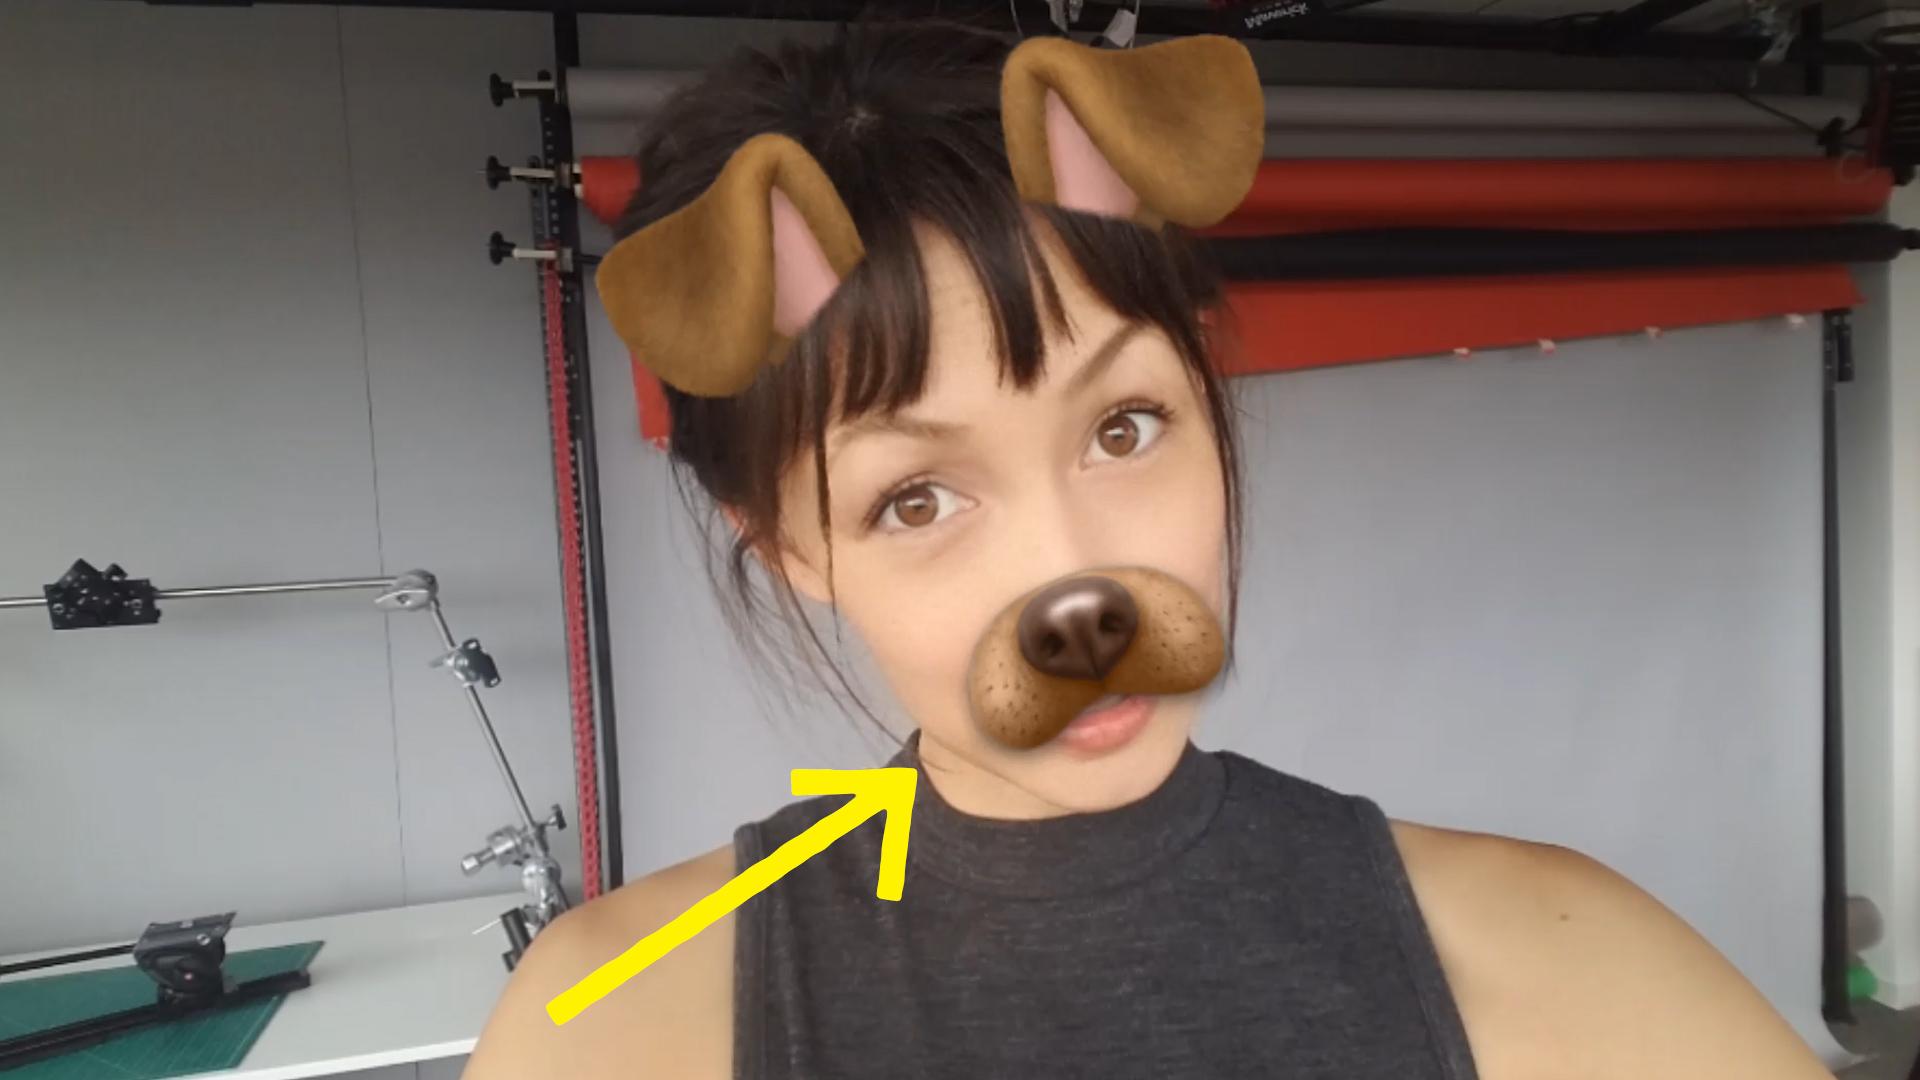 Dog Face Lens by Snap Inc.